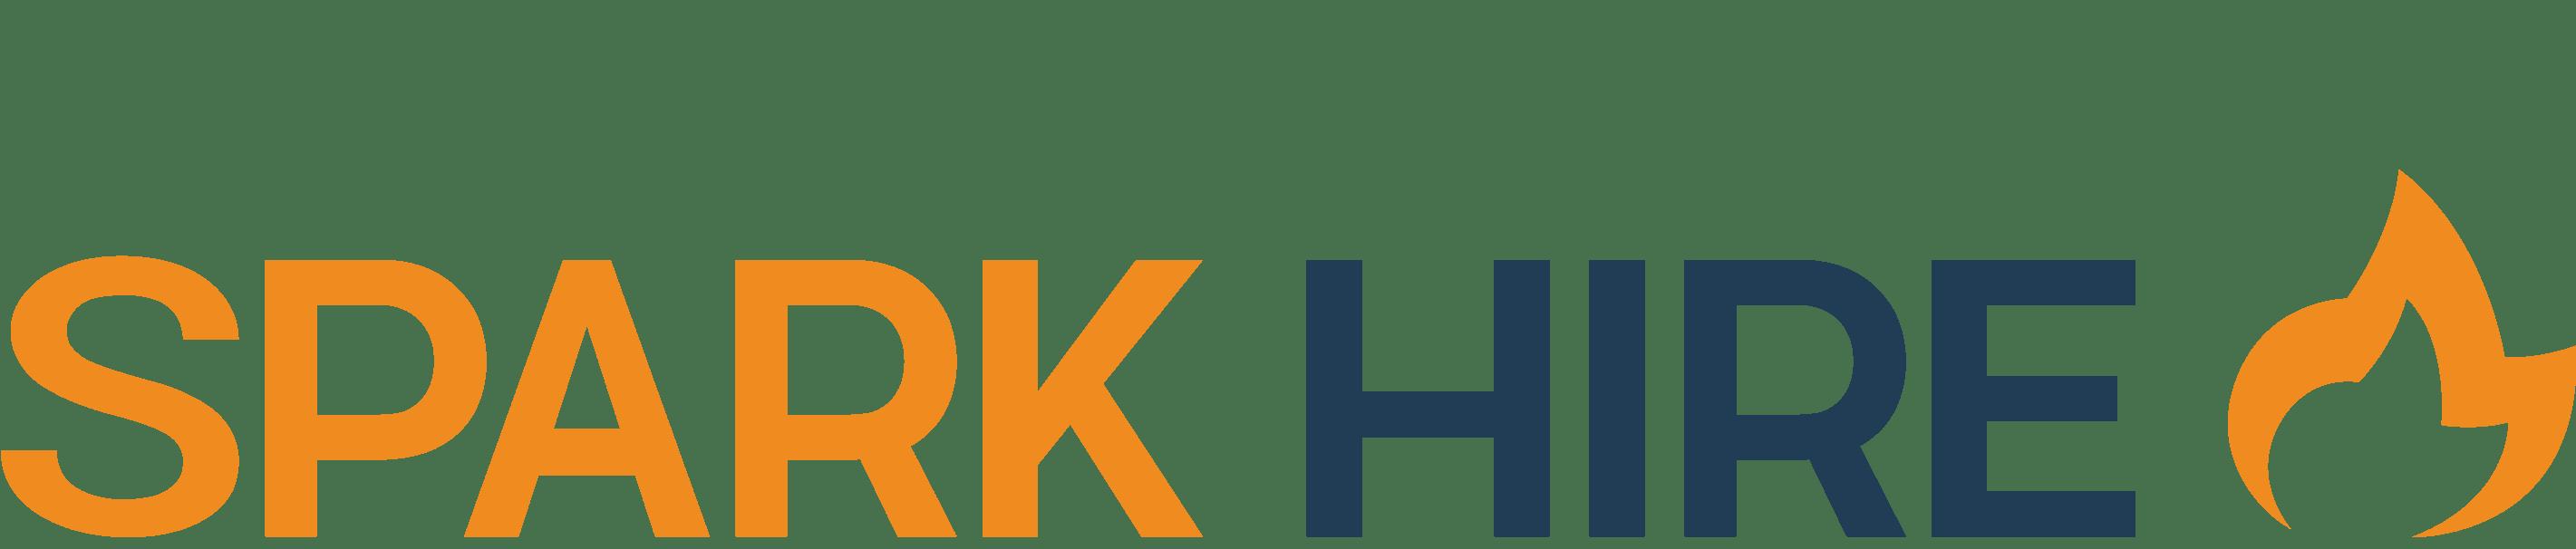 spark hire logo